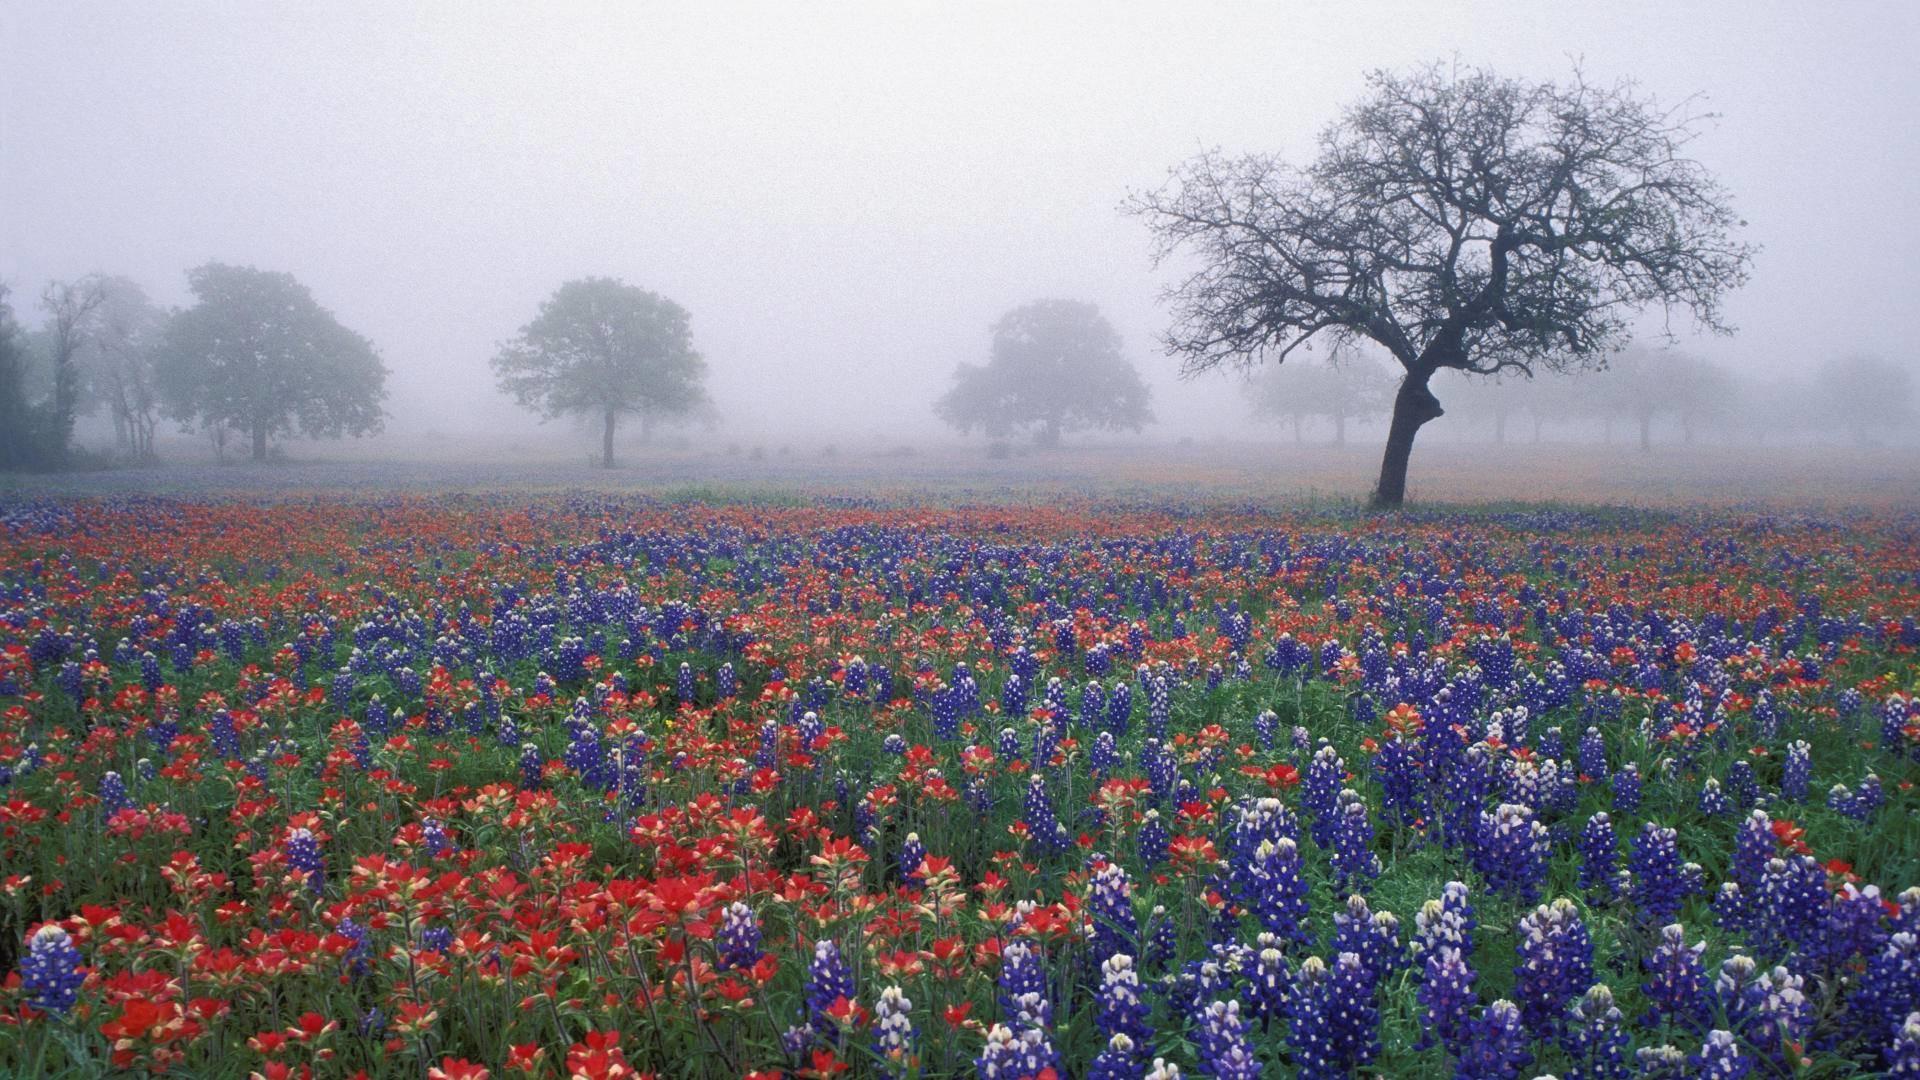 … texas landscape wallpaper hd wallpaper; bluebonnet wallpapers wallpaper  cave …